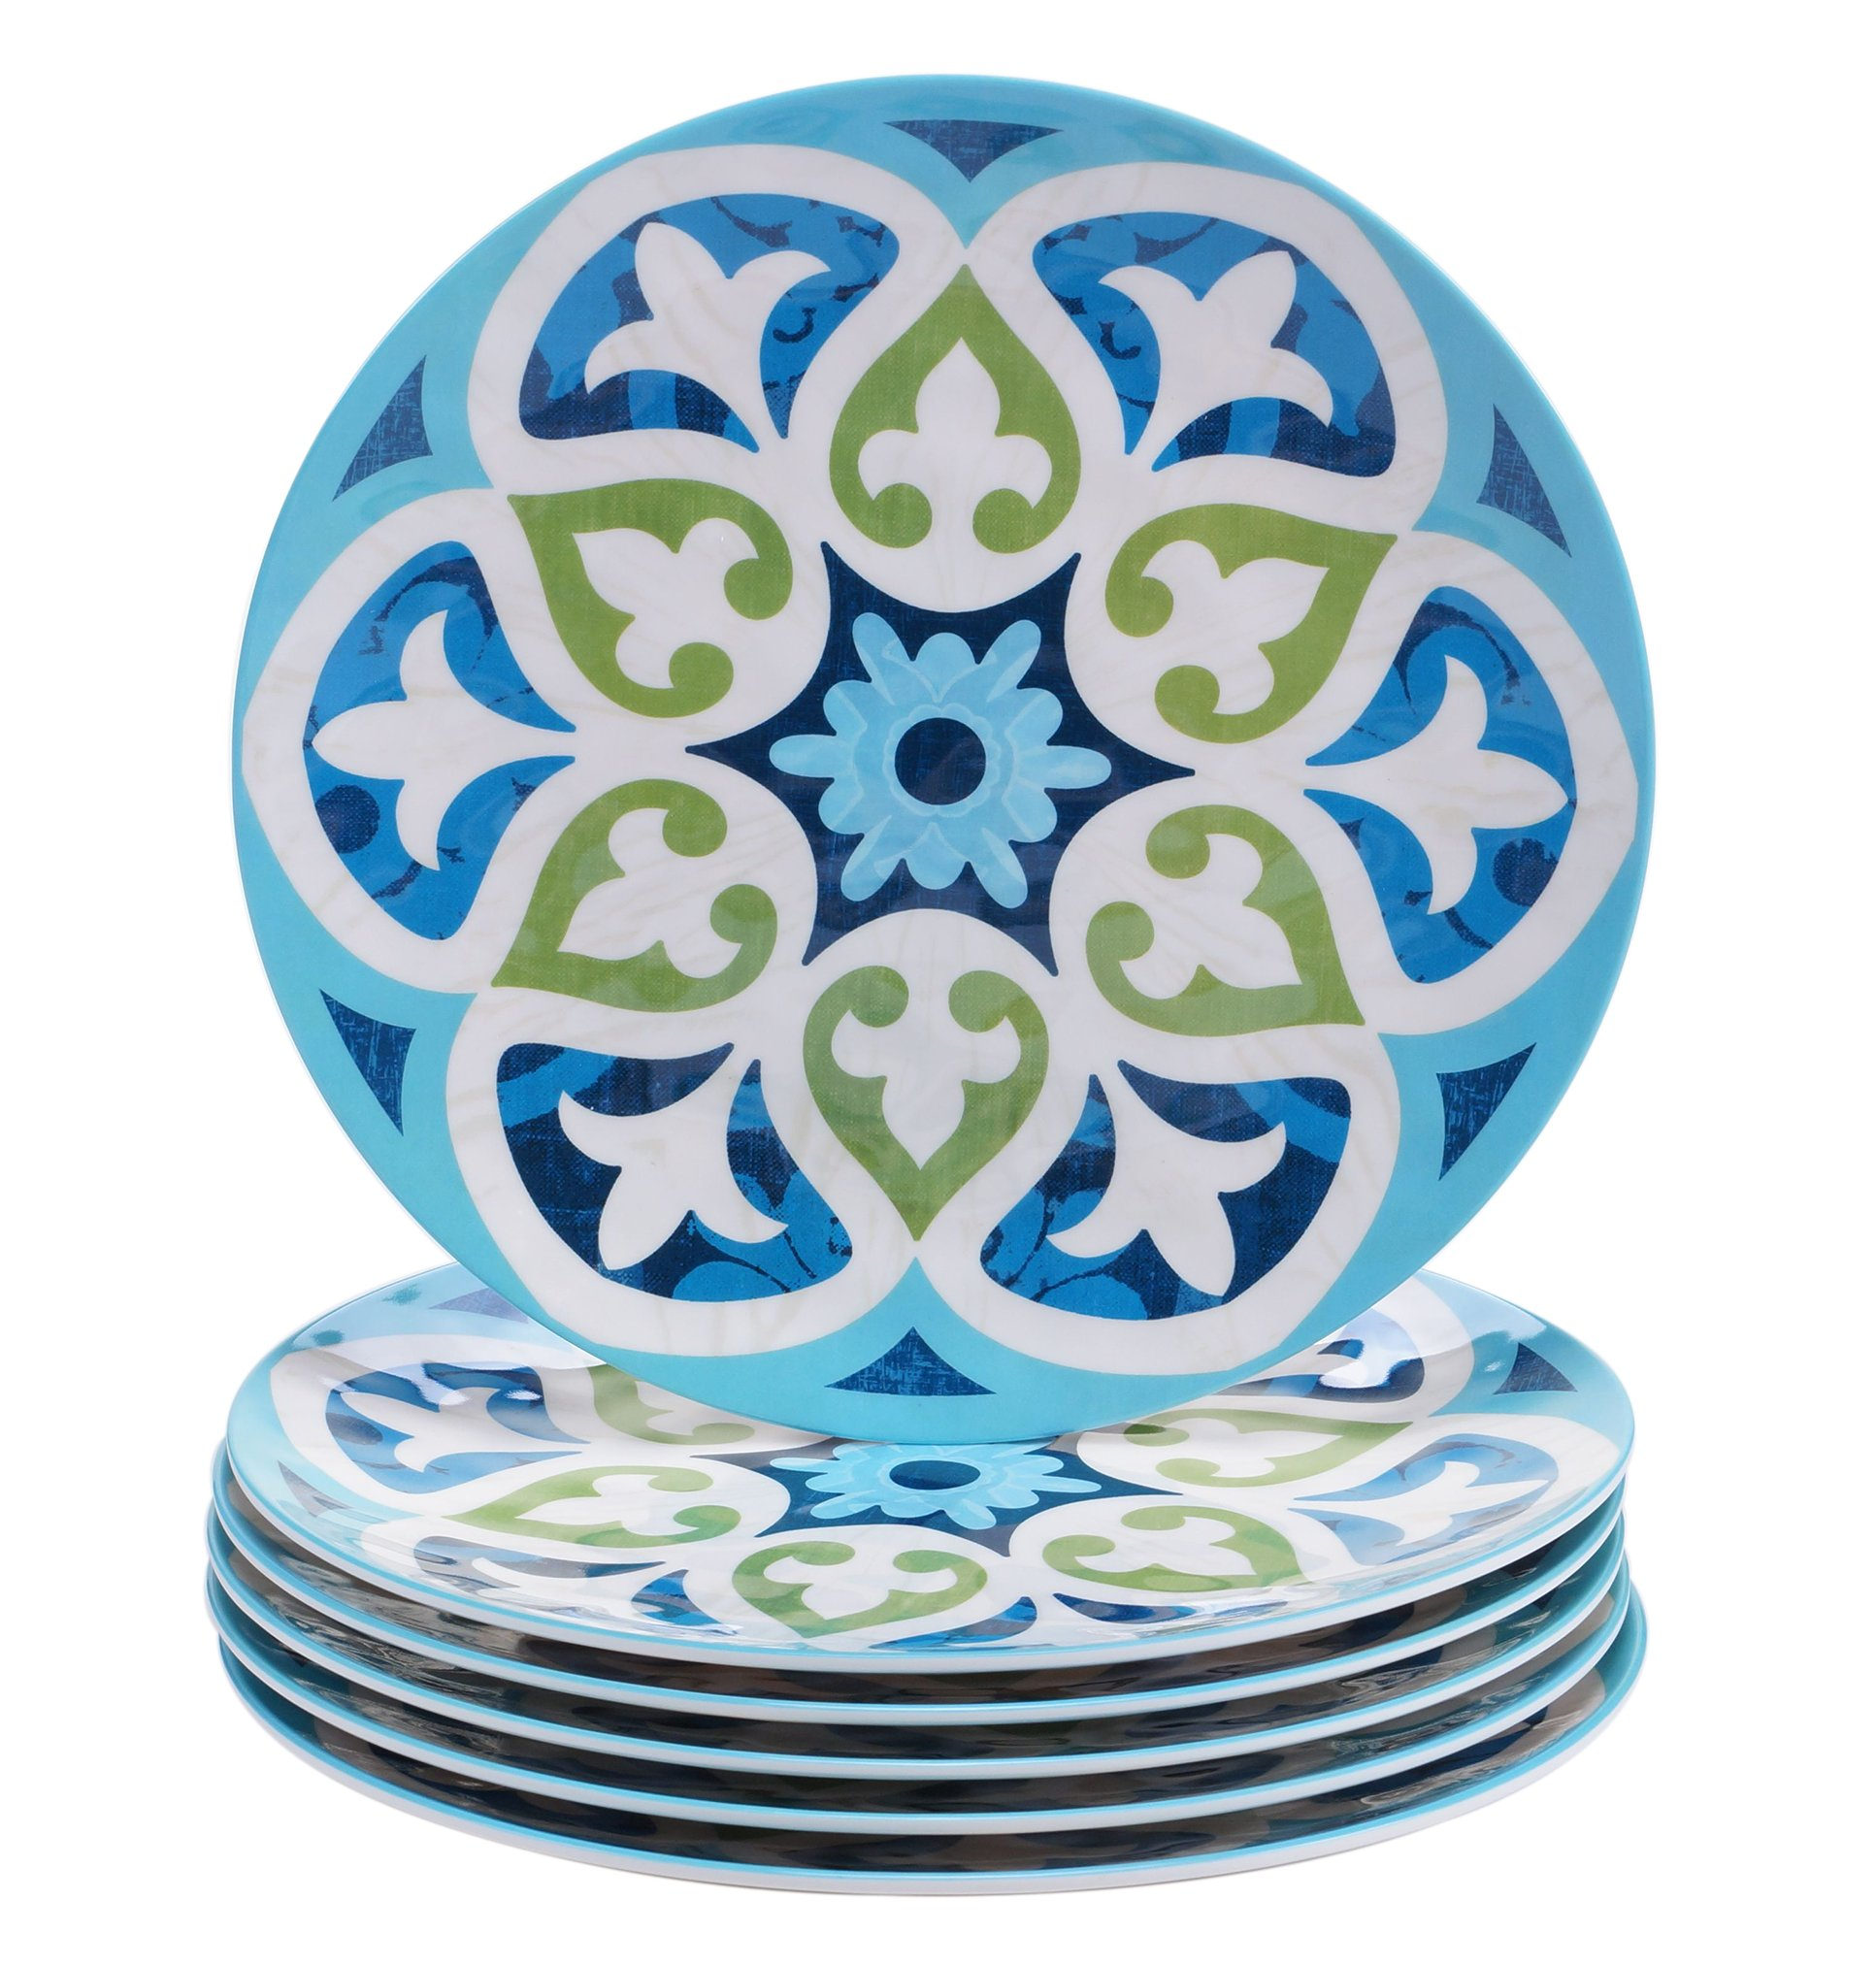 "Certified International Corp Barcelona Salad/Dessert Plates, 9"", Multicolored, Set of 6"